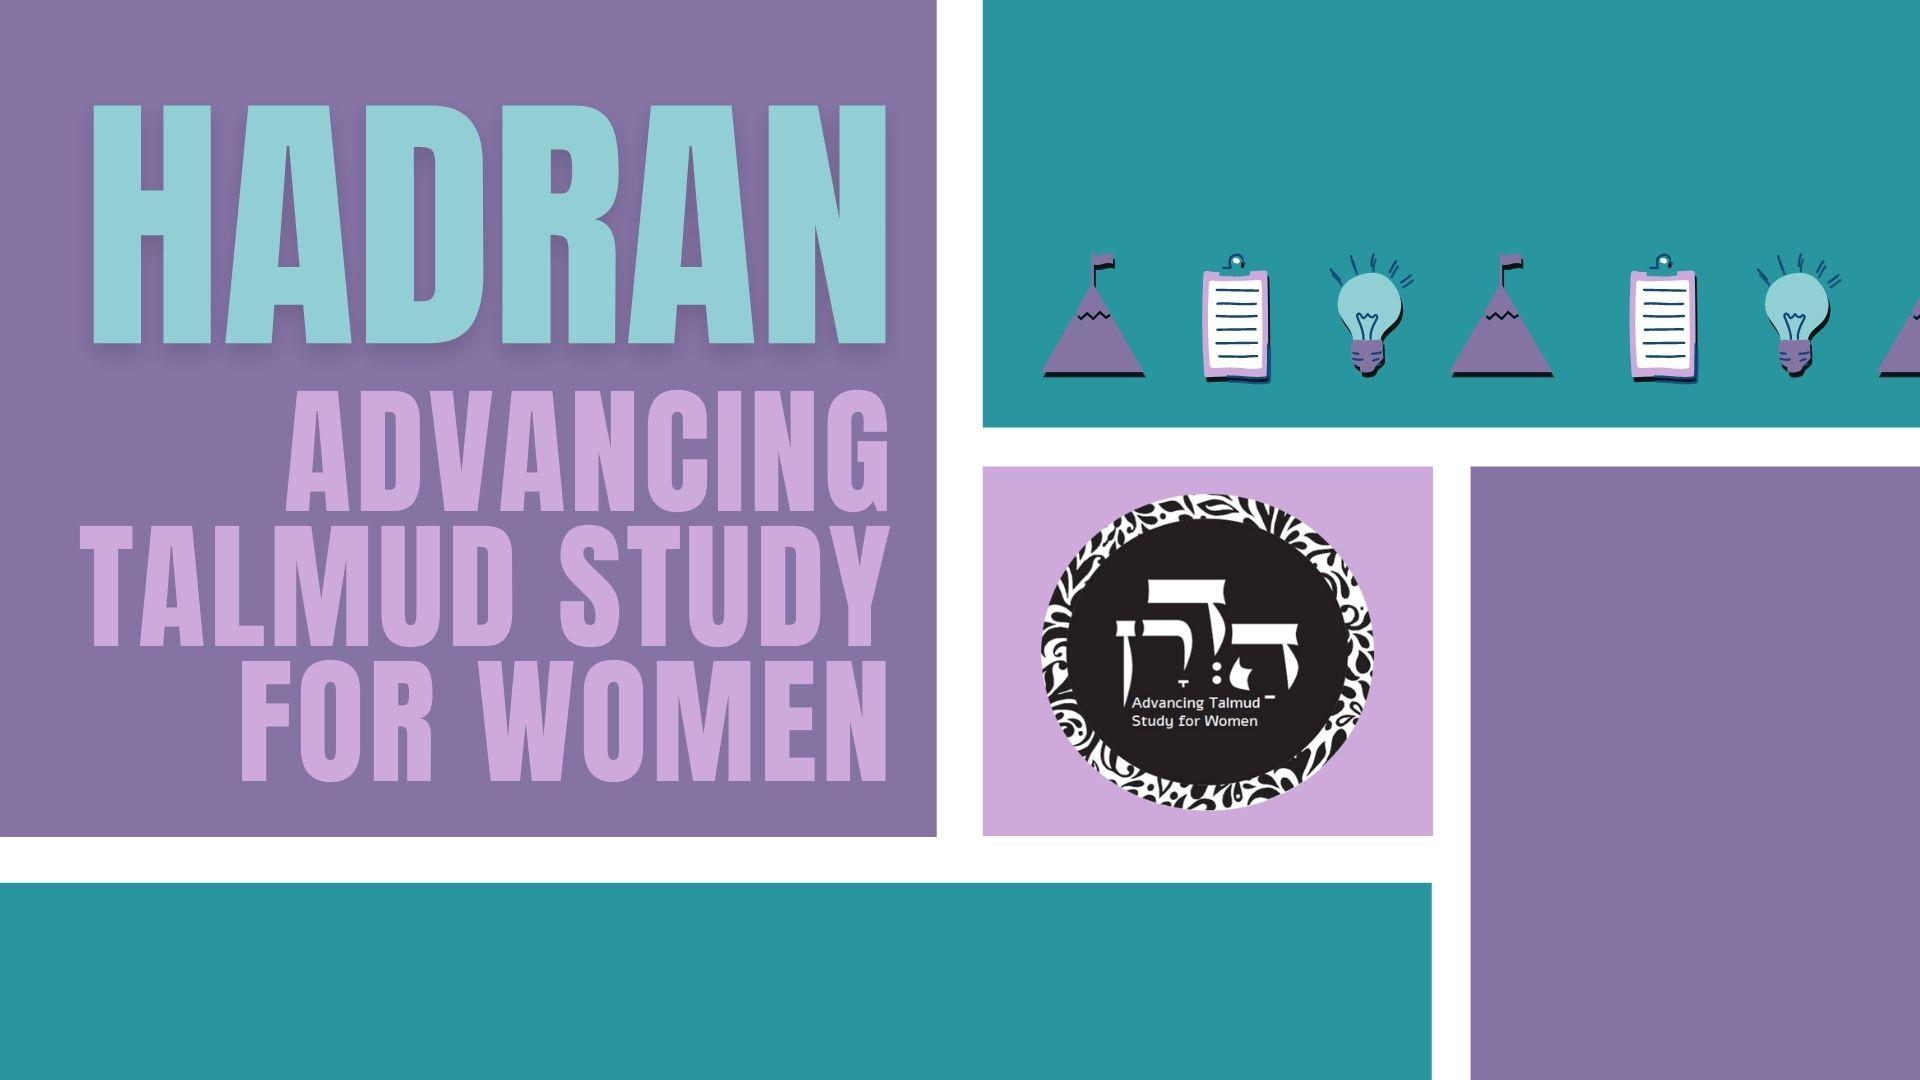 Hadran advancing talmud study for women homepage